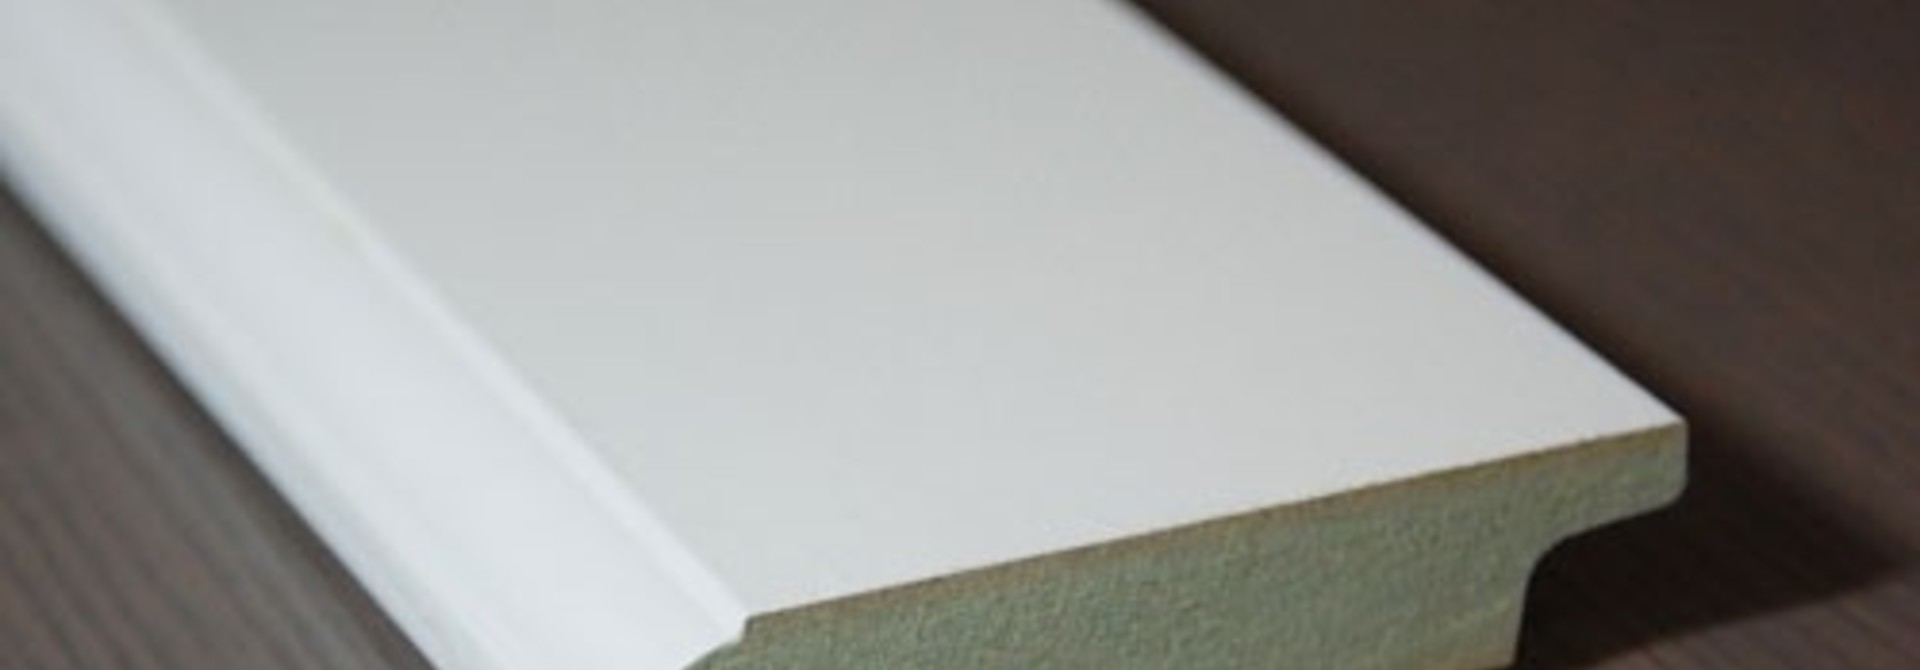 Stijlplint wit kraal 15x120